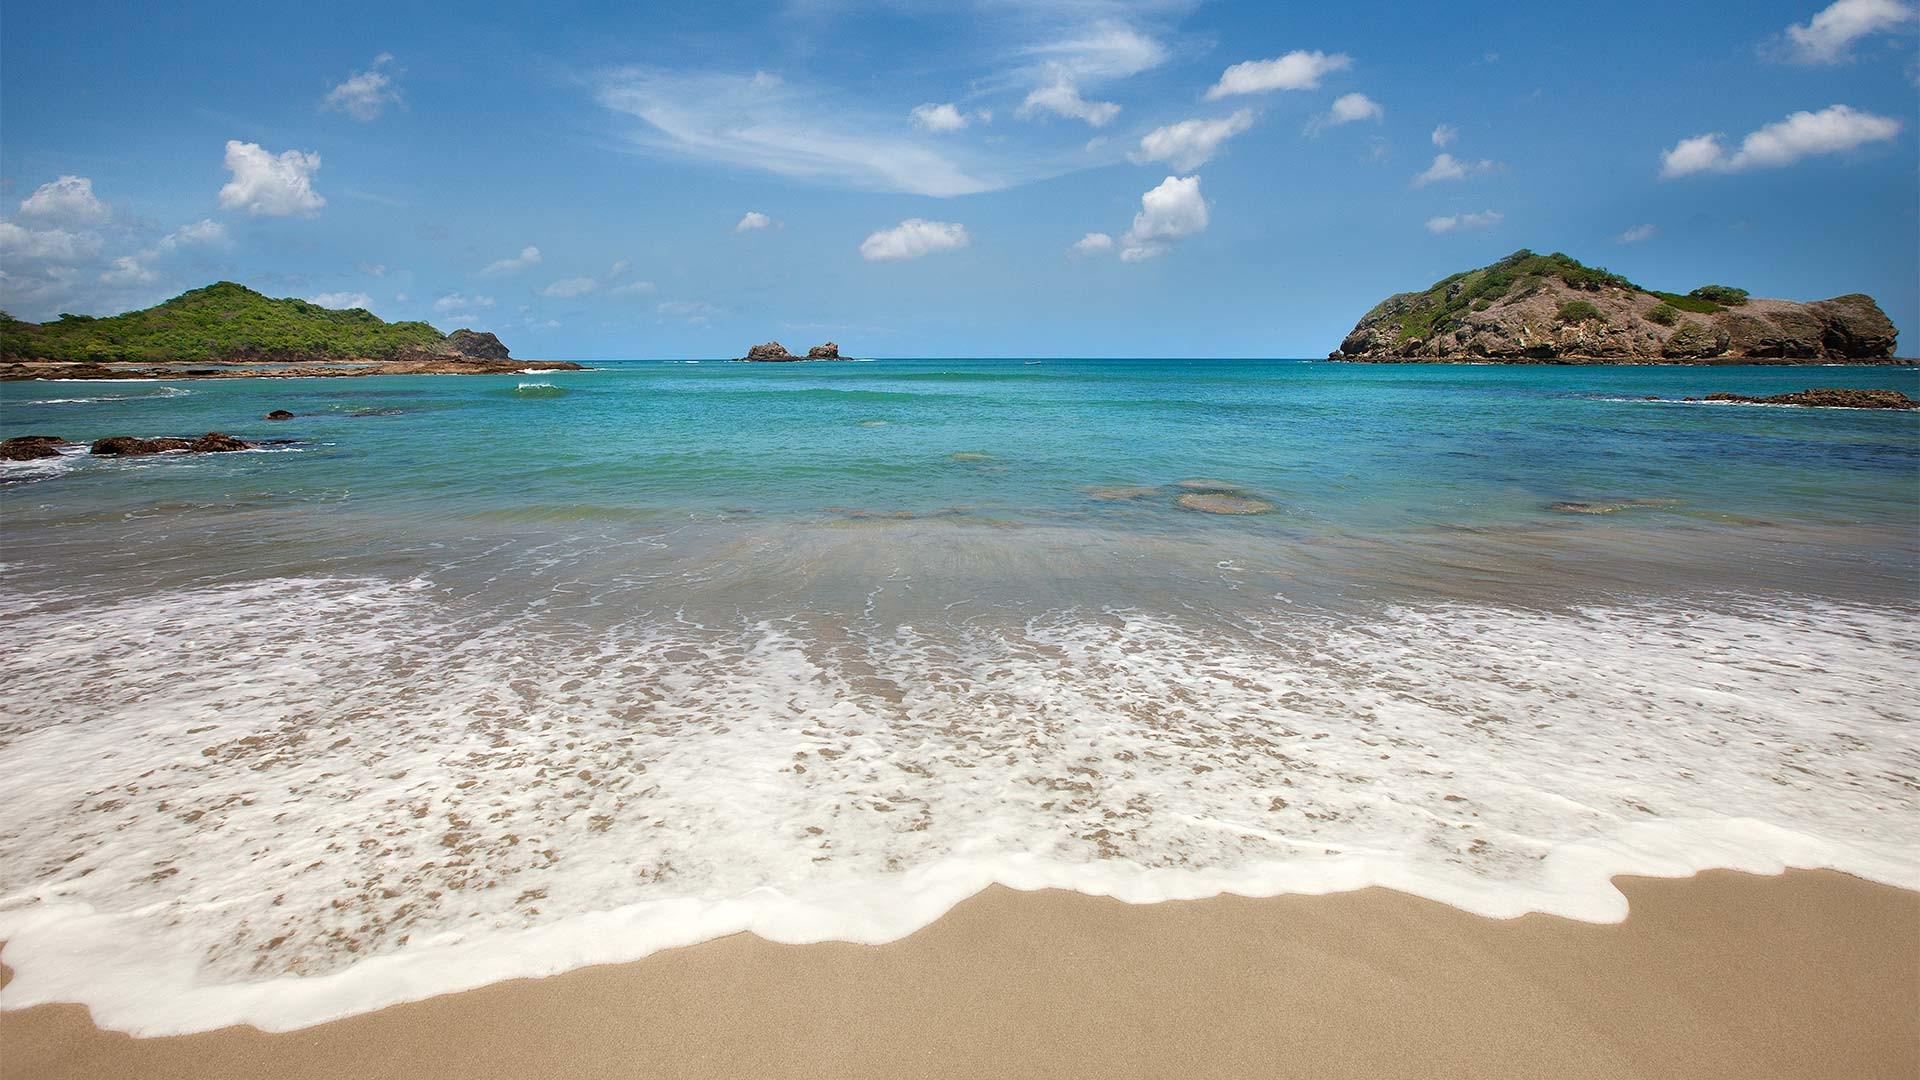 Earth – Beach Horizon Earth Ocean Sea Nicaragua Island Wallpaper